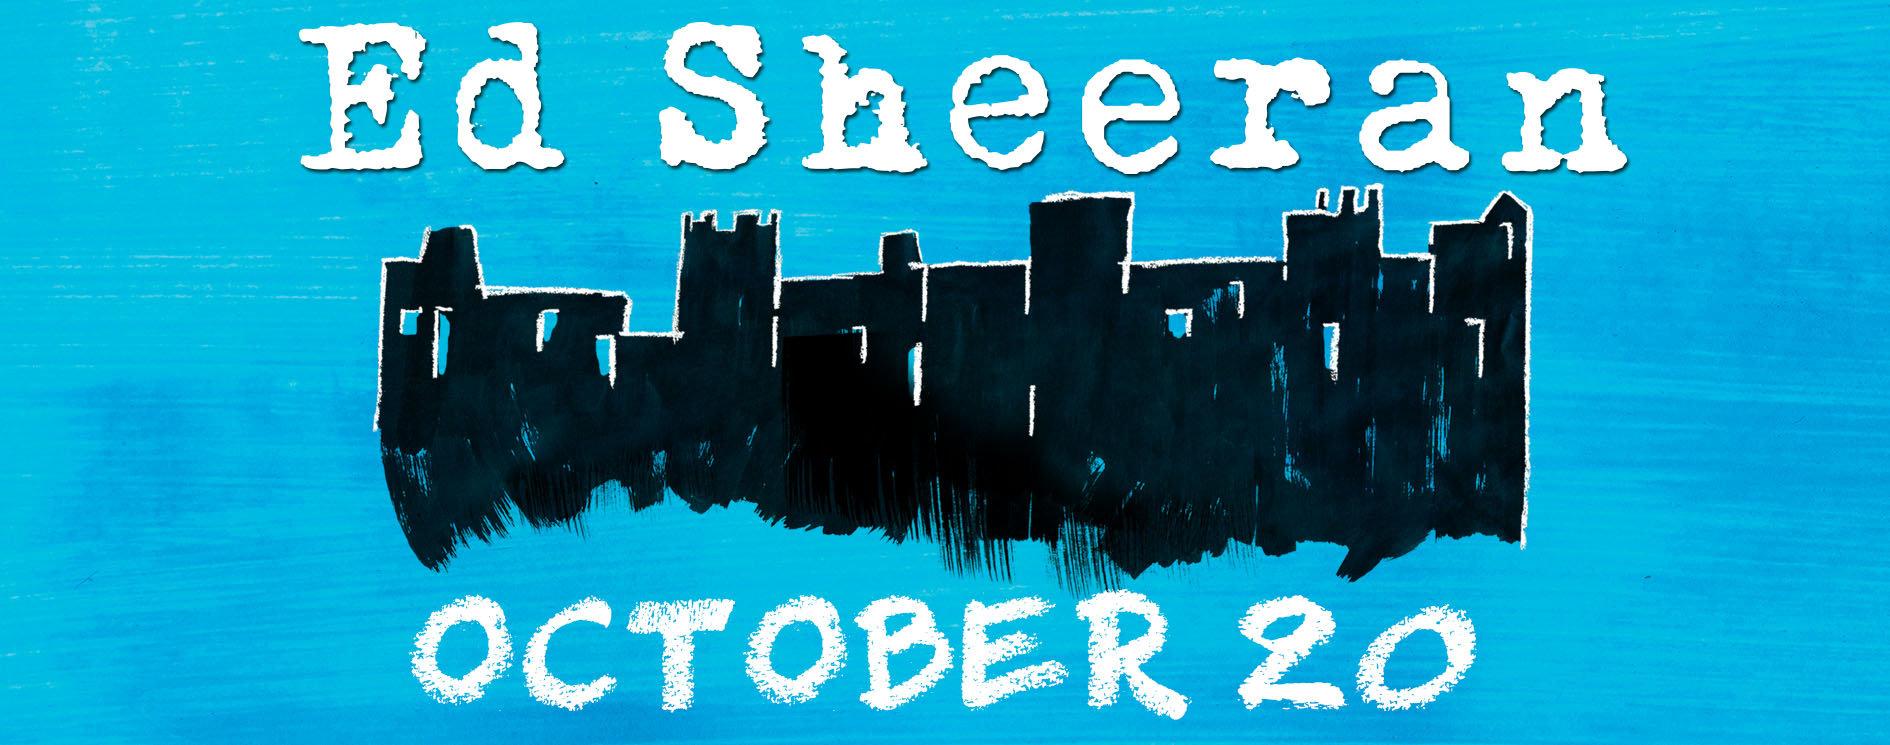 Win tickets to see ed sheeran 1013 kdwb win tickets to see ed sheeran m4hsunfo